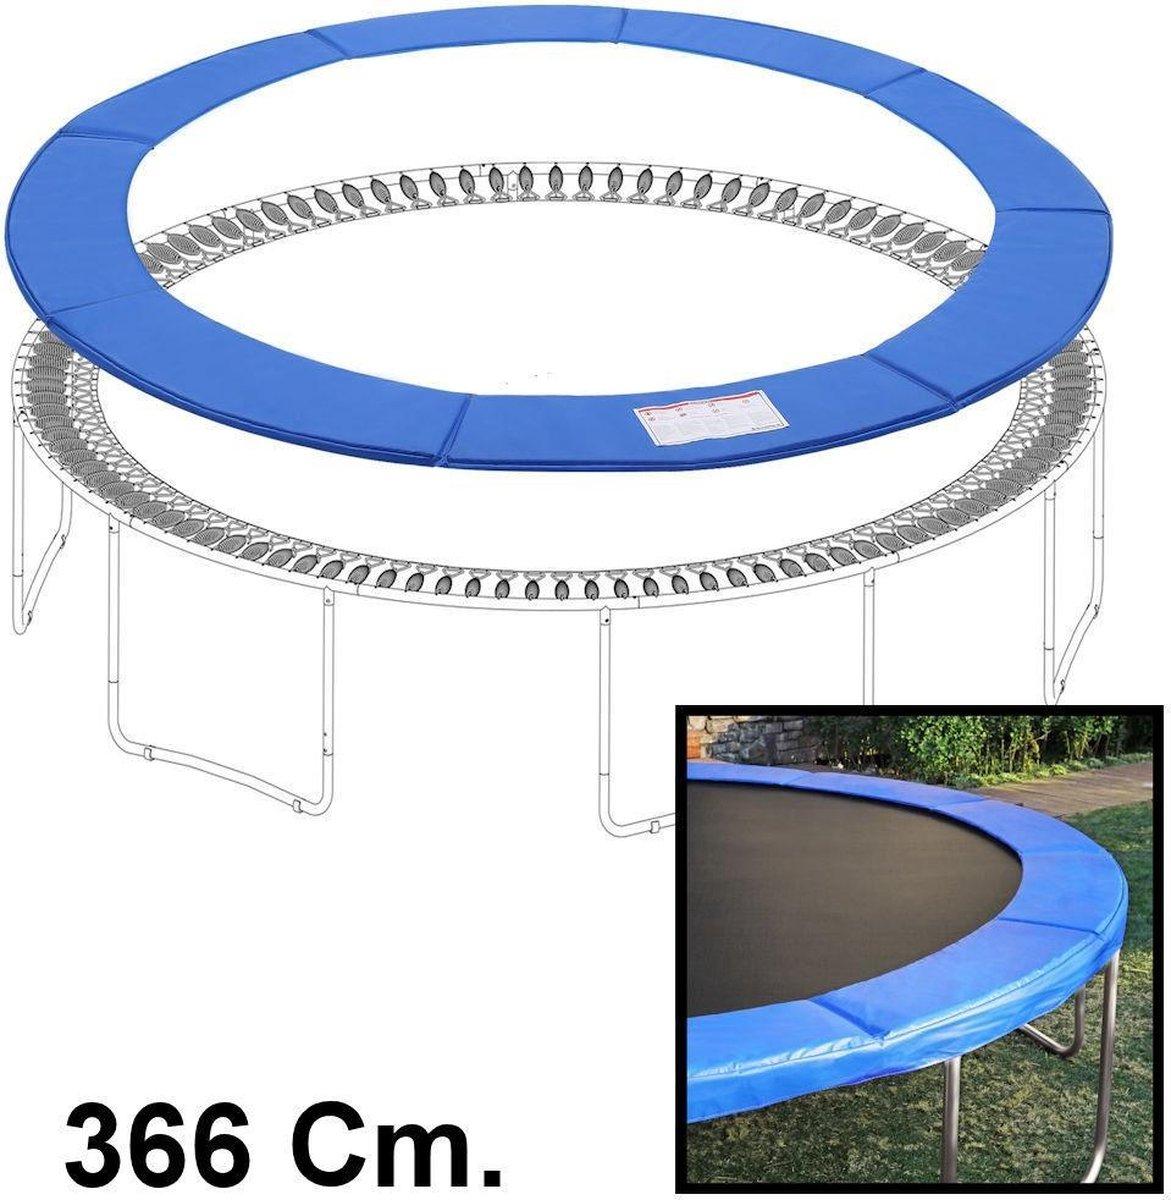 Sterke Trampolinerand 366 Cm diameter – Rond - Hoge kwaliteit beschermrand - Blauw - Trampoline rand afdekking universeel - Beschermrand voor Trampoli